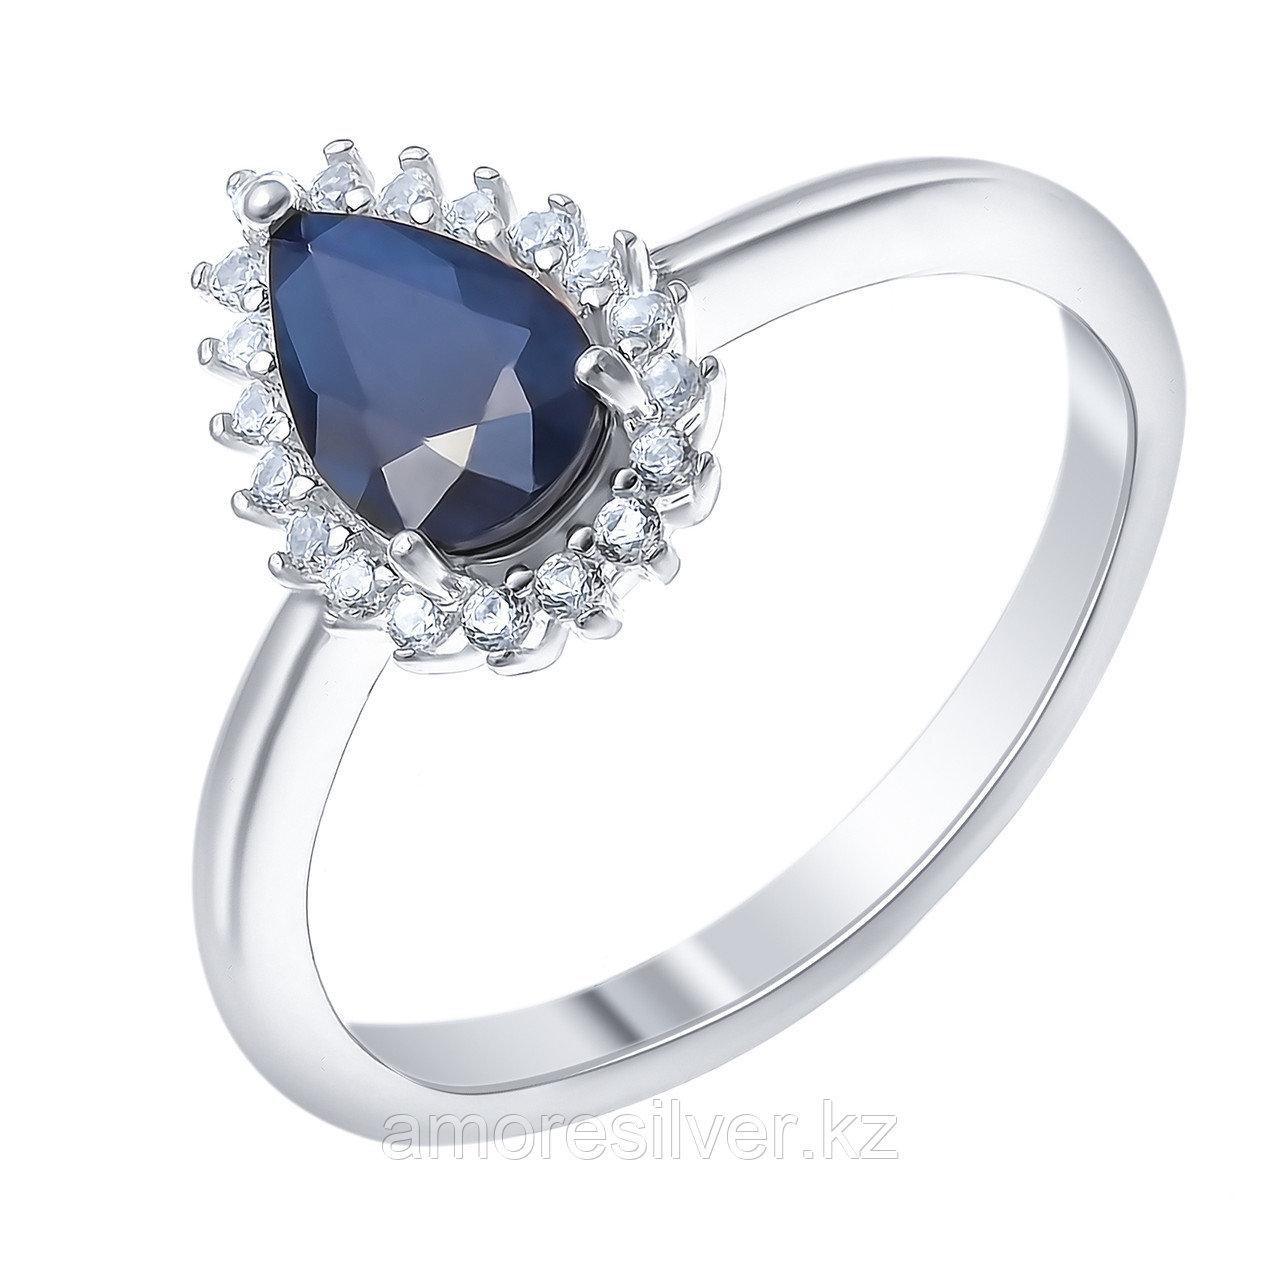 "Кольцо Teosa серебро с родием, сапфир топаз, ""halo"" R-DRGR00905-SP-T"